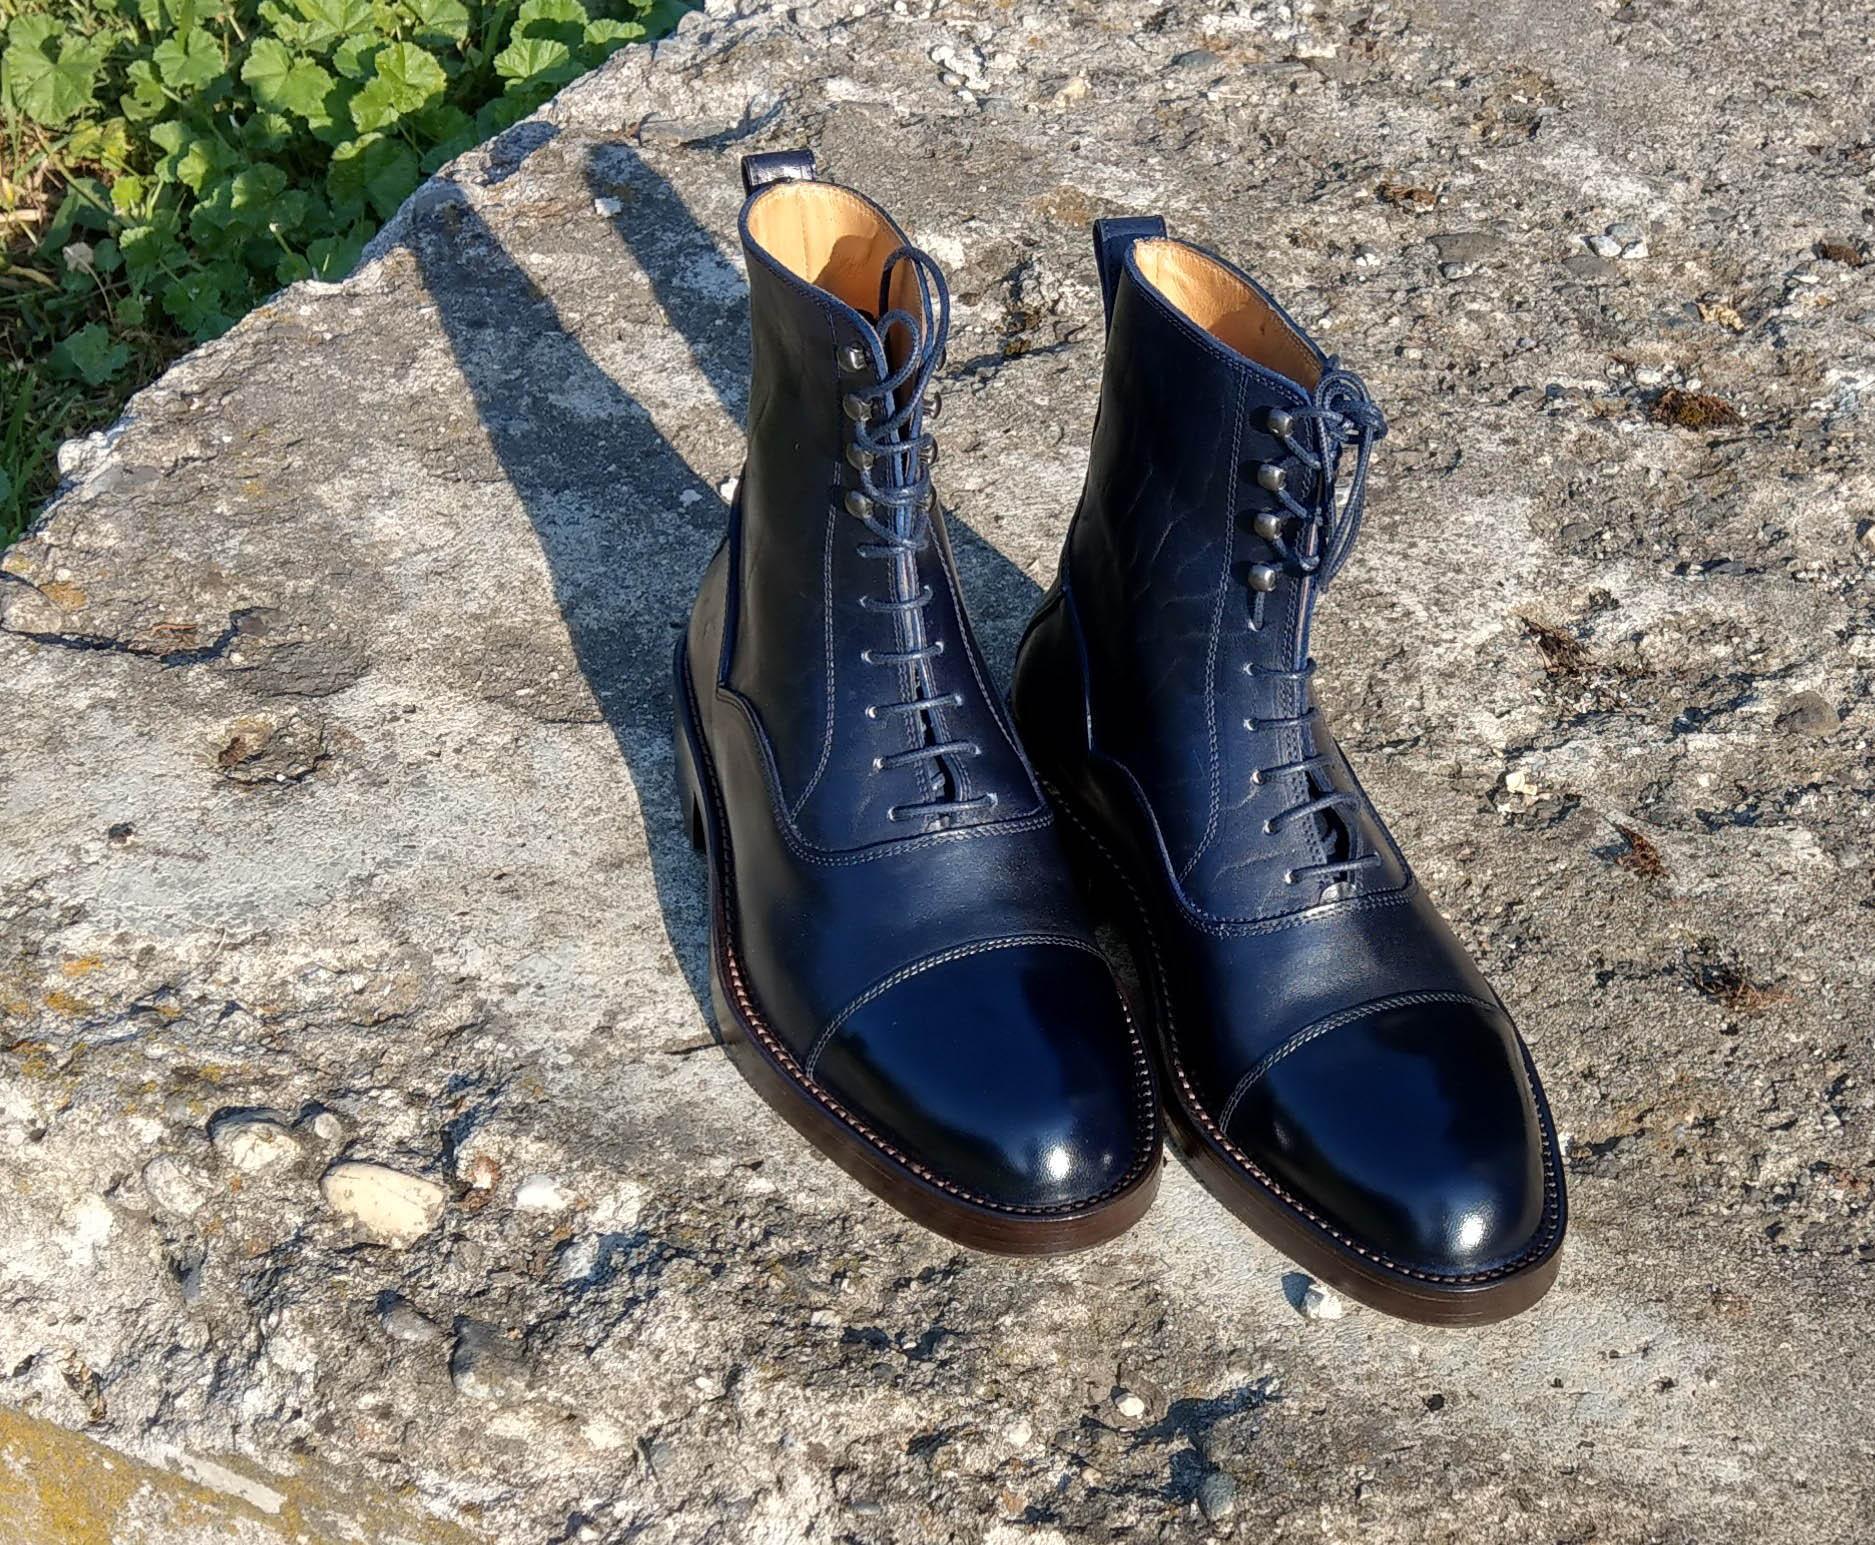 Navy-Horsehide-Balmoral-Boots-010.jpg